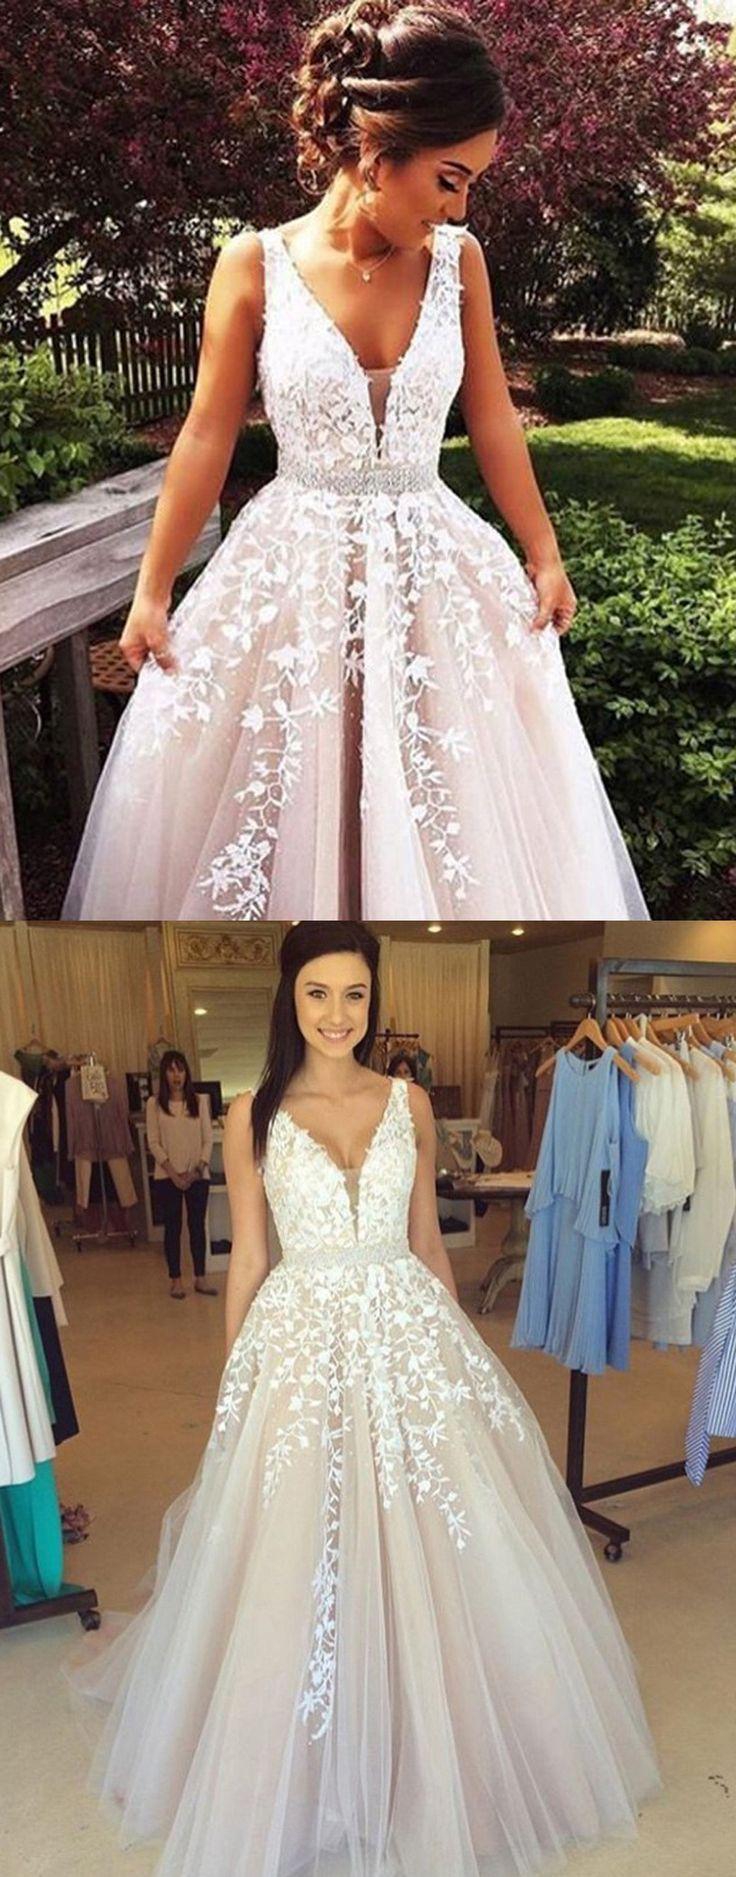 prom dresses,fashion dresses,2017 prom dresses,cheap prom dresses,new arrival prom dresses, cheap prom dresses  2017, high quality prom dresses, unique prom dresses, long prom dresses, lace prom dresses